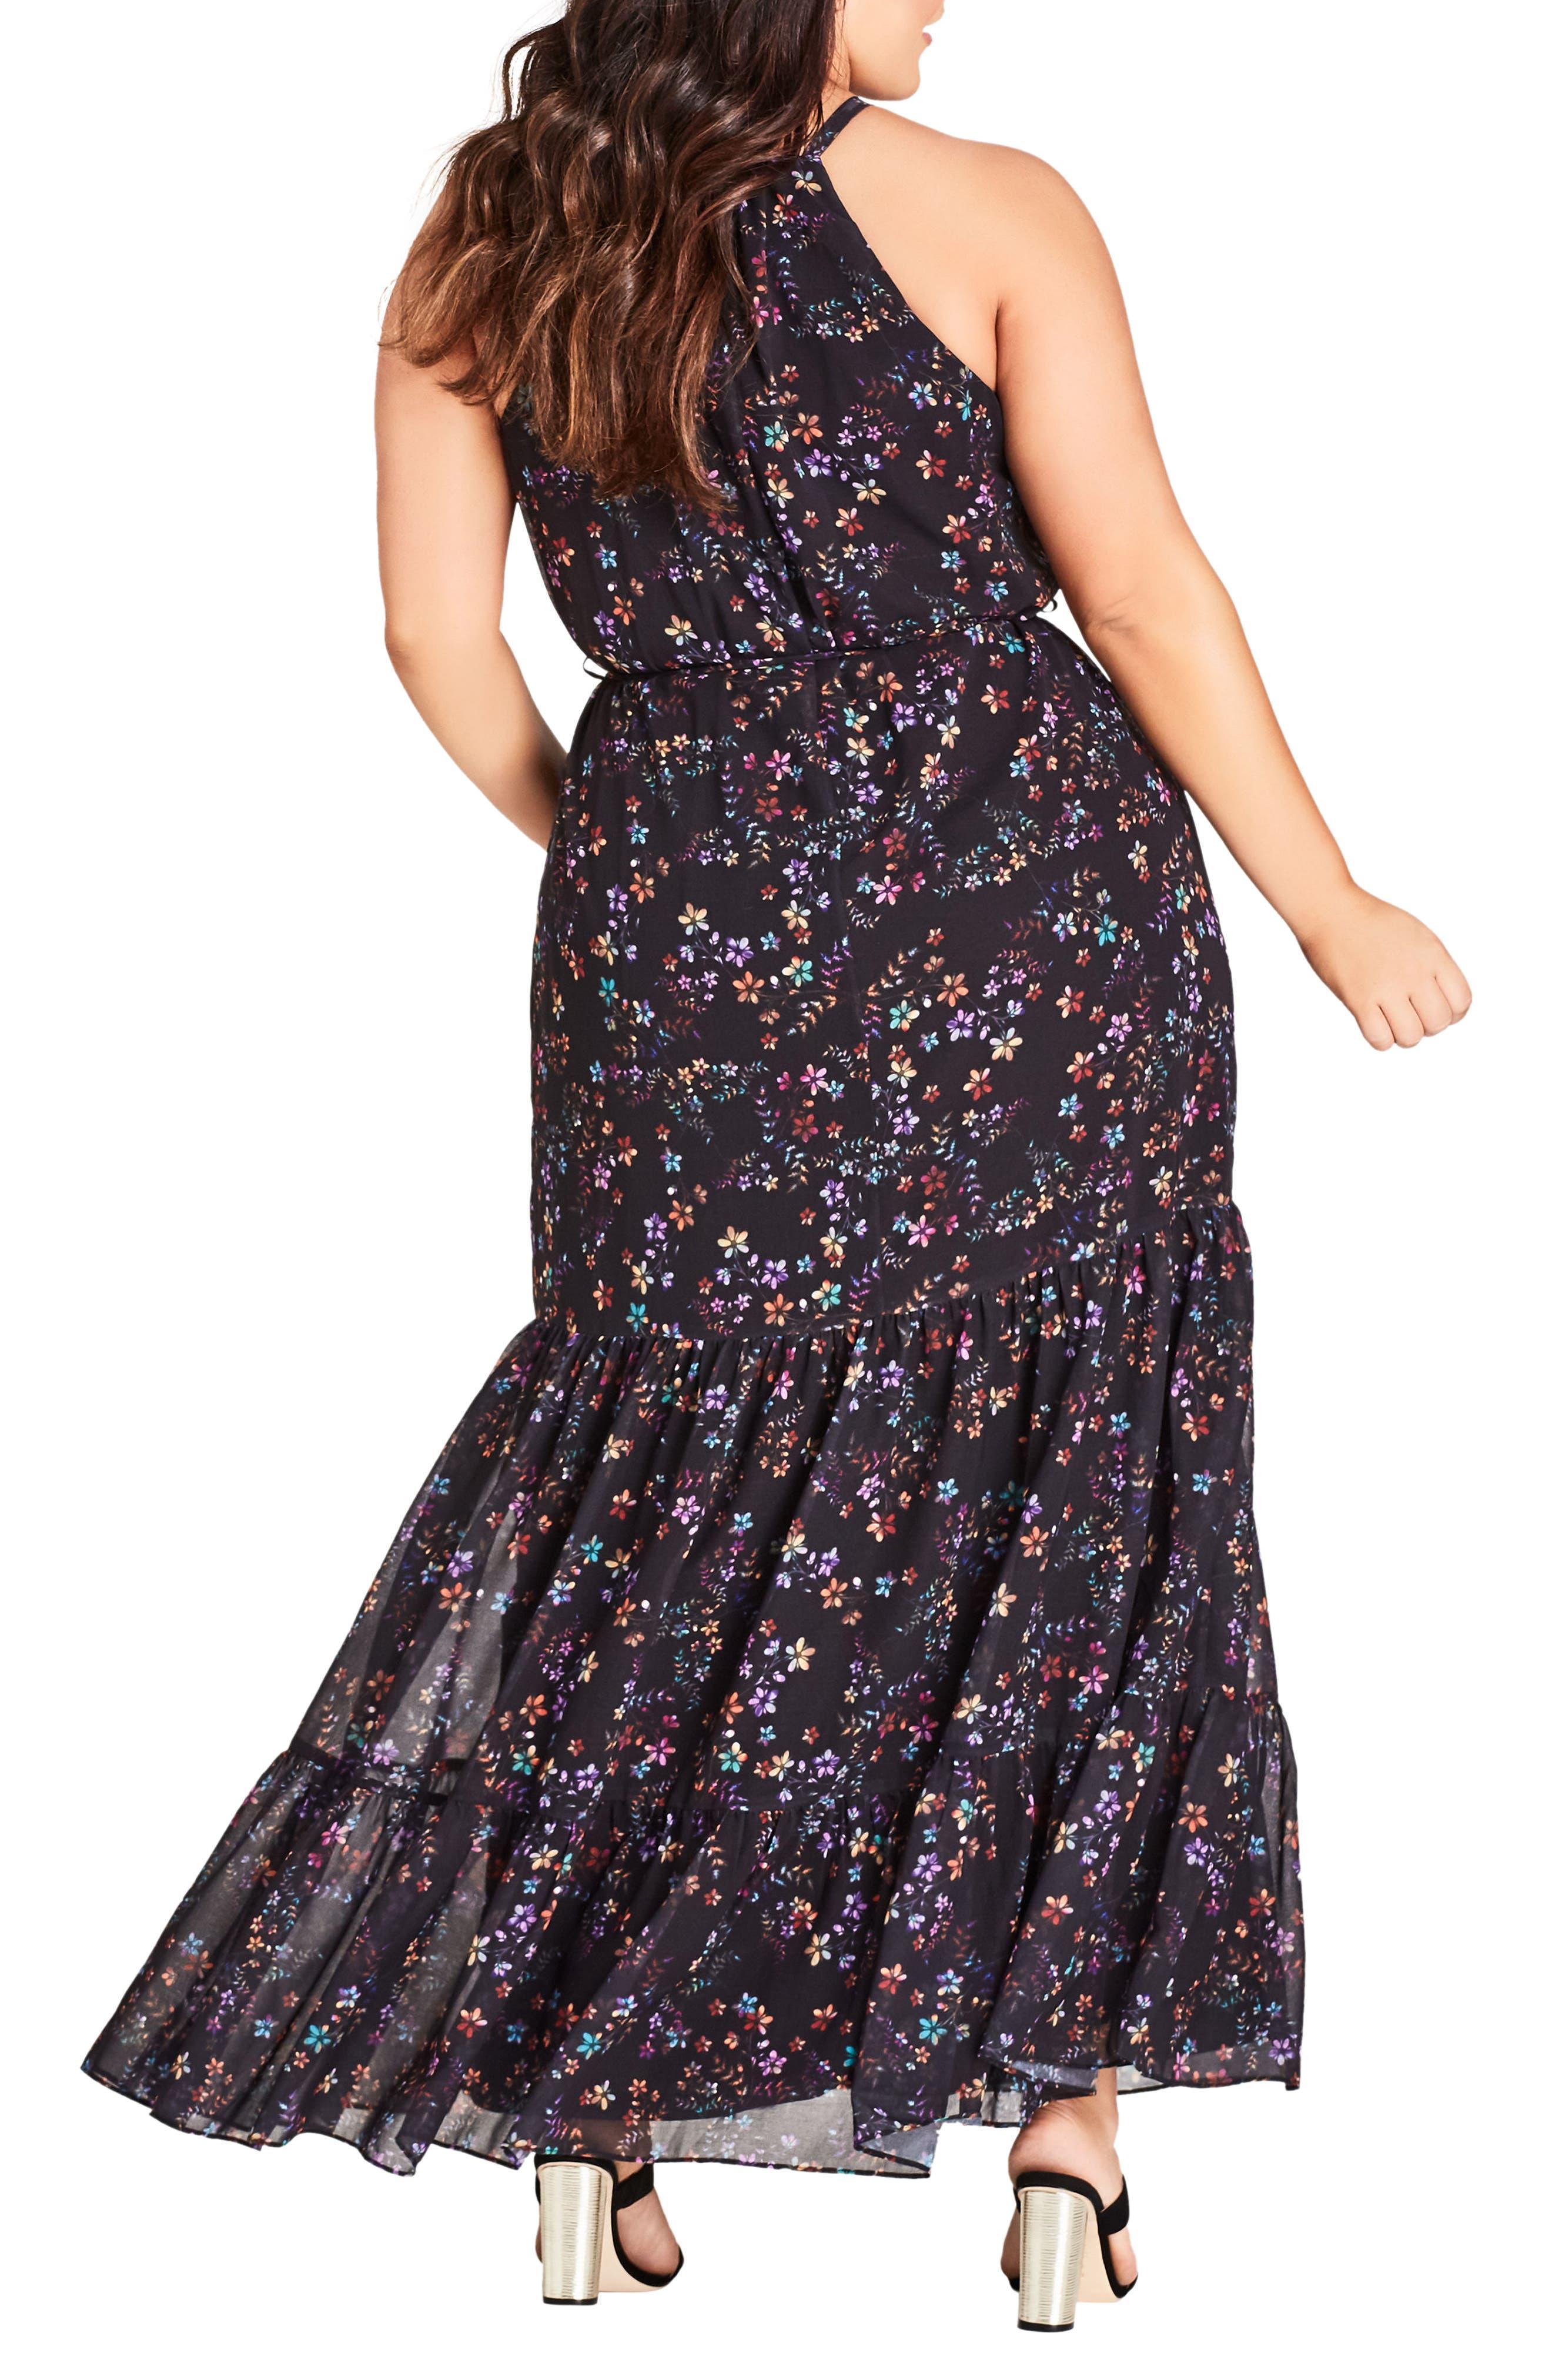 Sweet Dreams Maxi Dress,                             Alternate thumbnail 2, color,                             DREAMY FLORAL